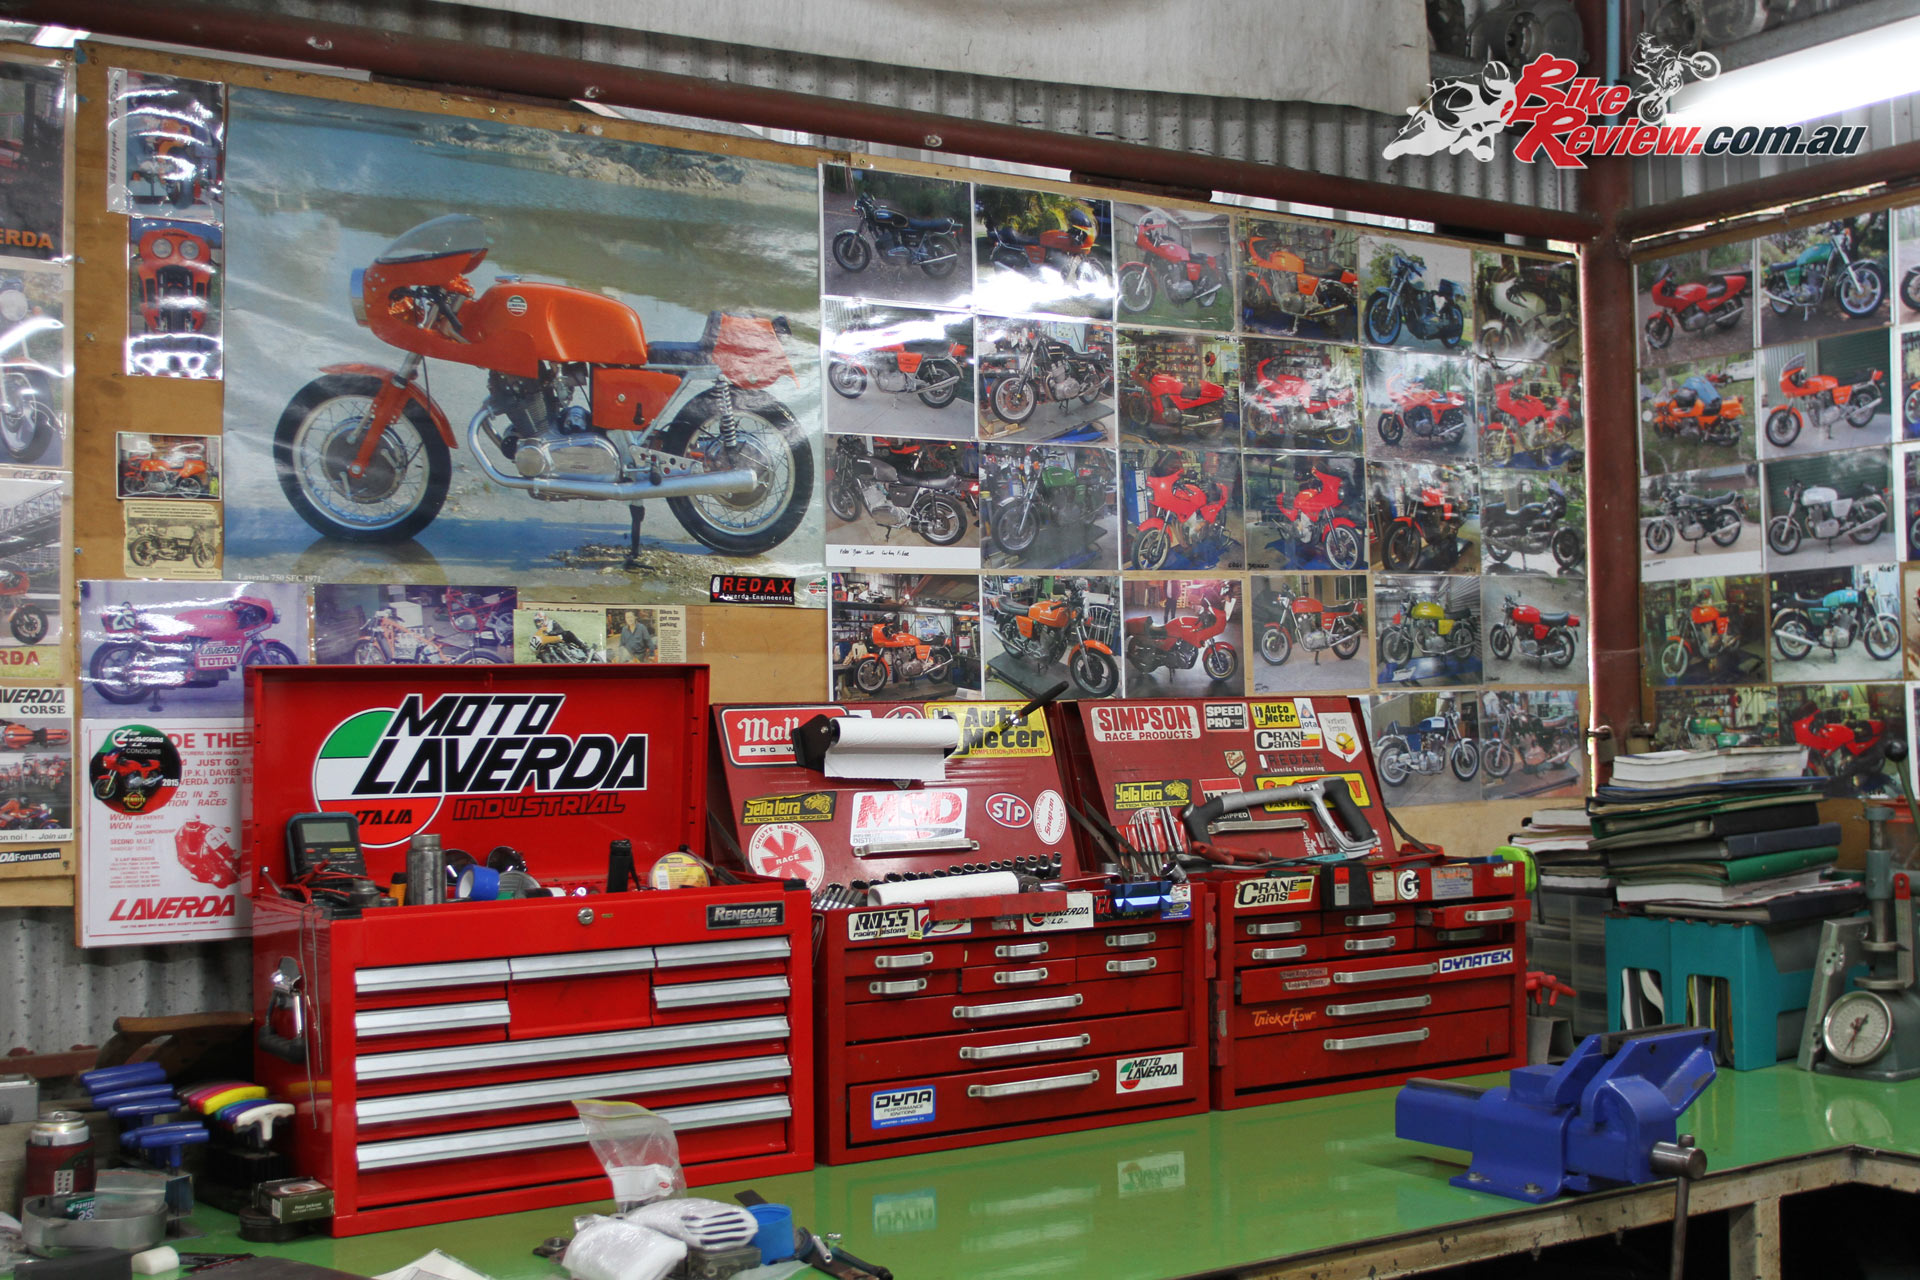 Redax Laverda Workshop - All the Laverdas that Red has worked on